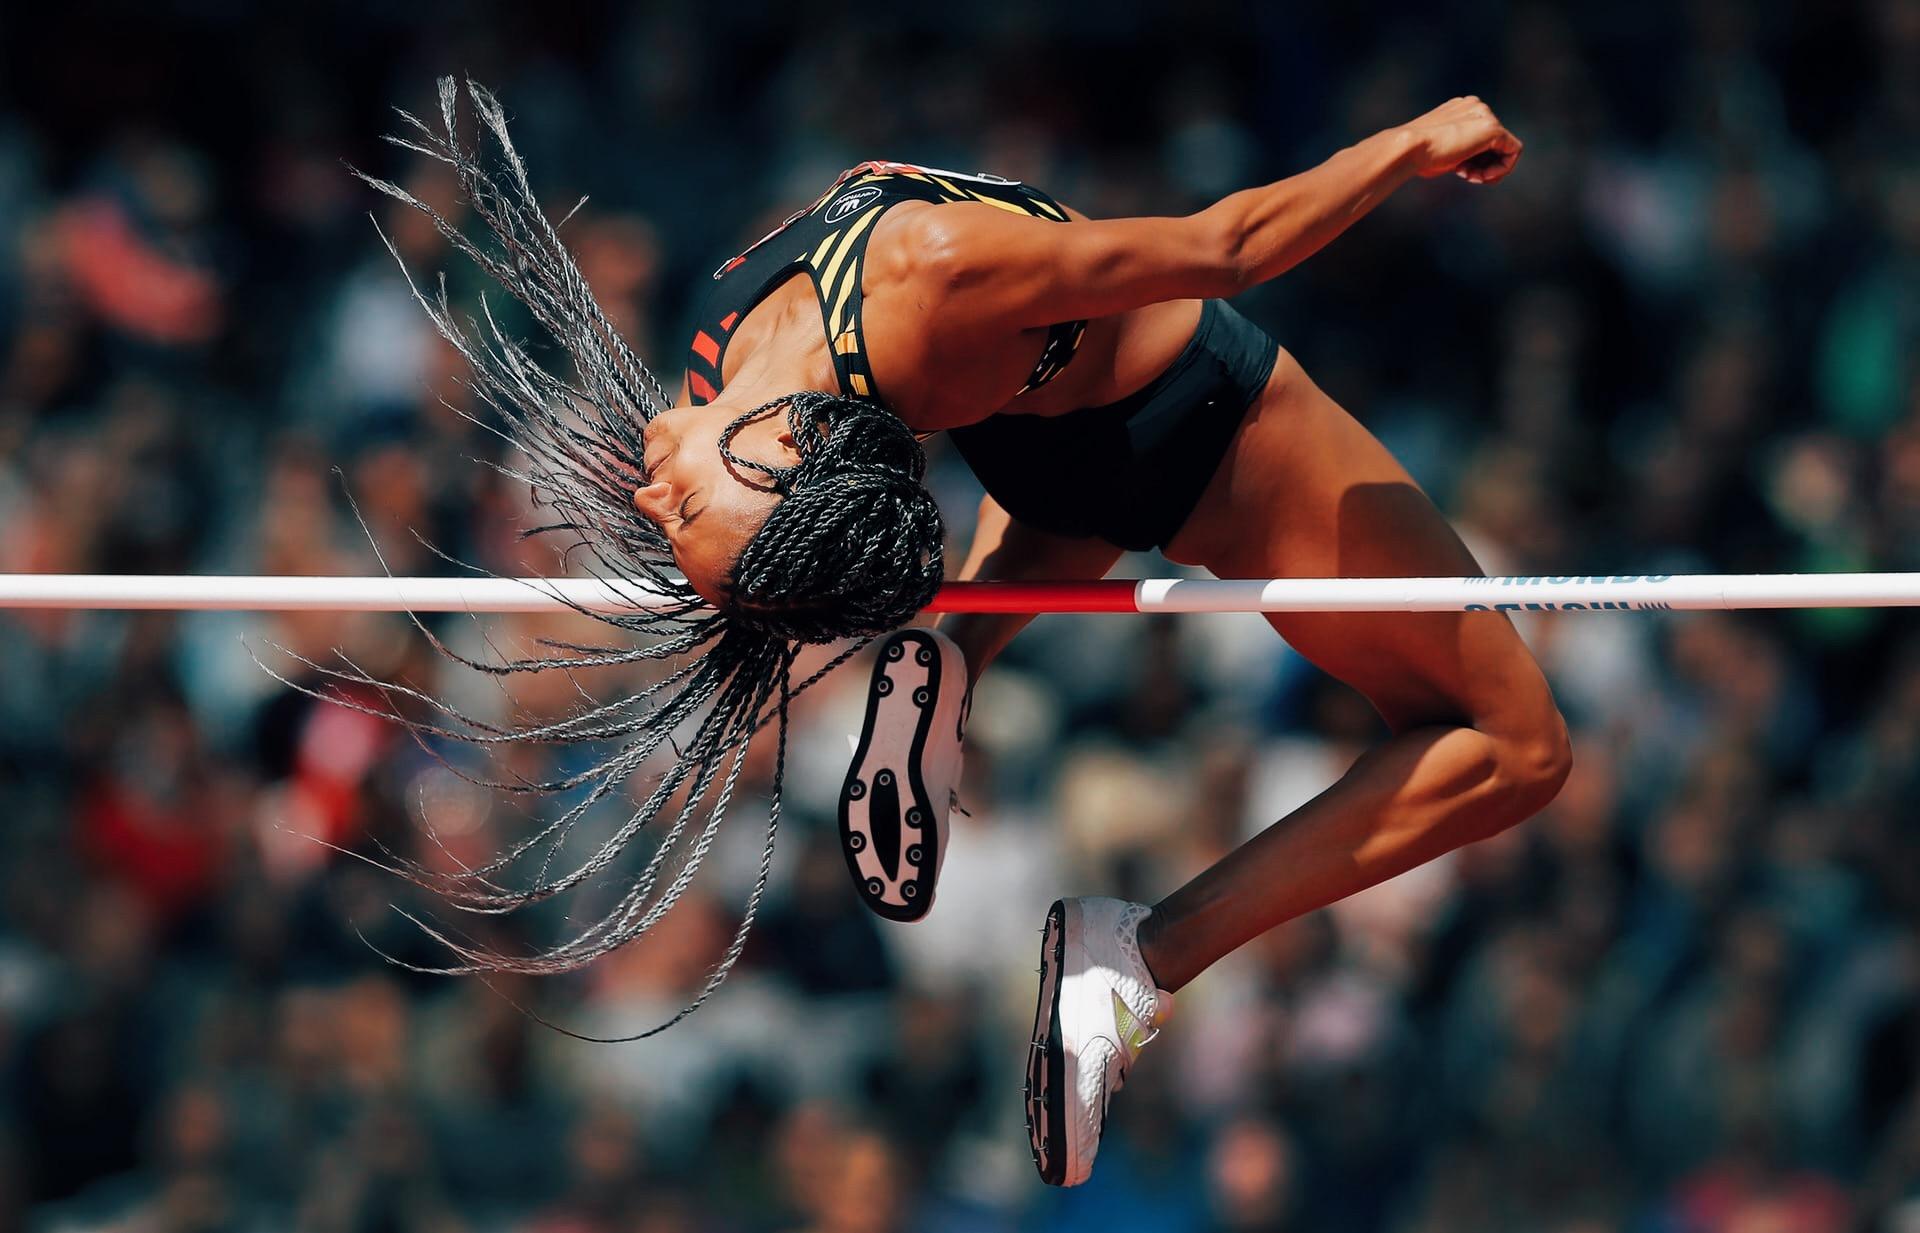 Nafi-Thiam-best-photo-ever-womens-athletics.jpg